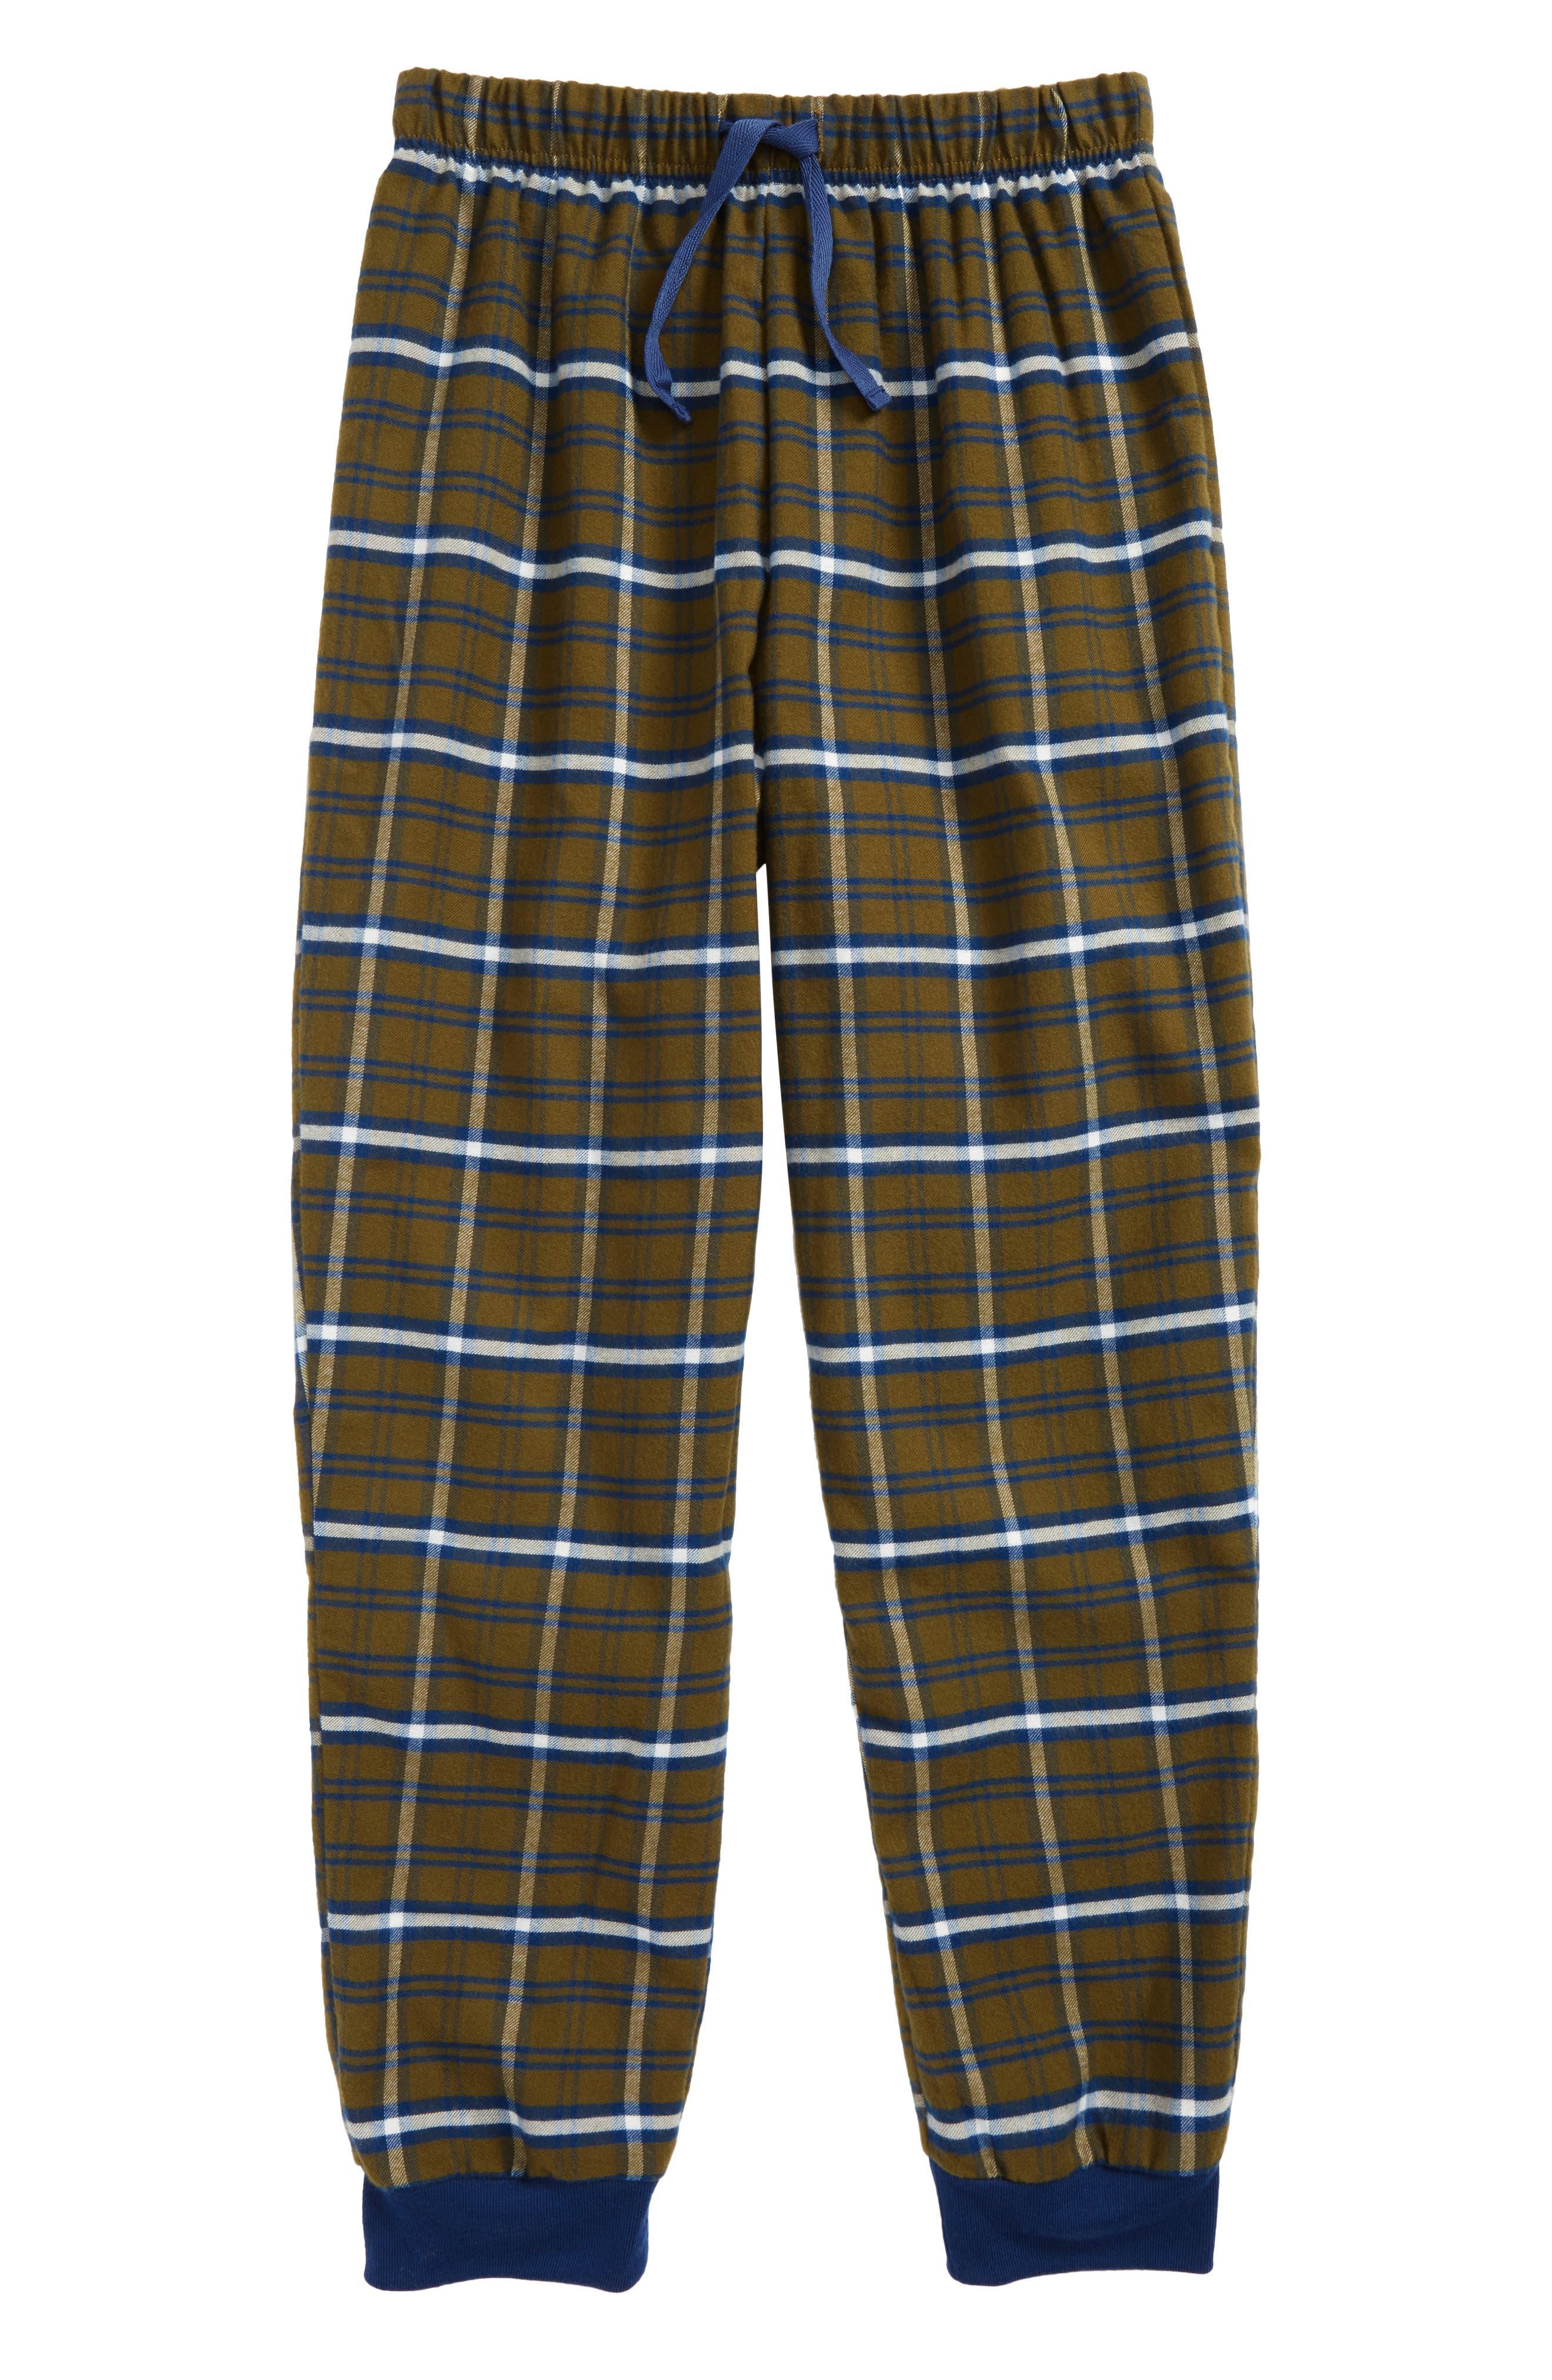 Alternate Image 1 Selected - Tucker + Tate Flannel Jogger Pants (Little Boys & Big Boys)